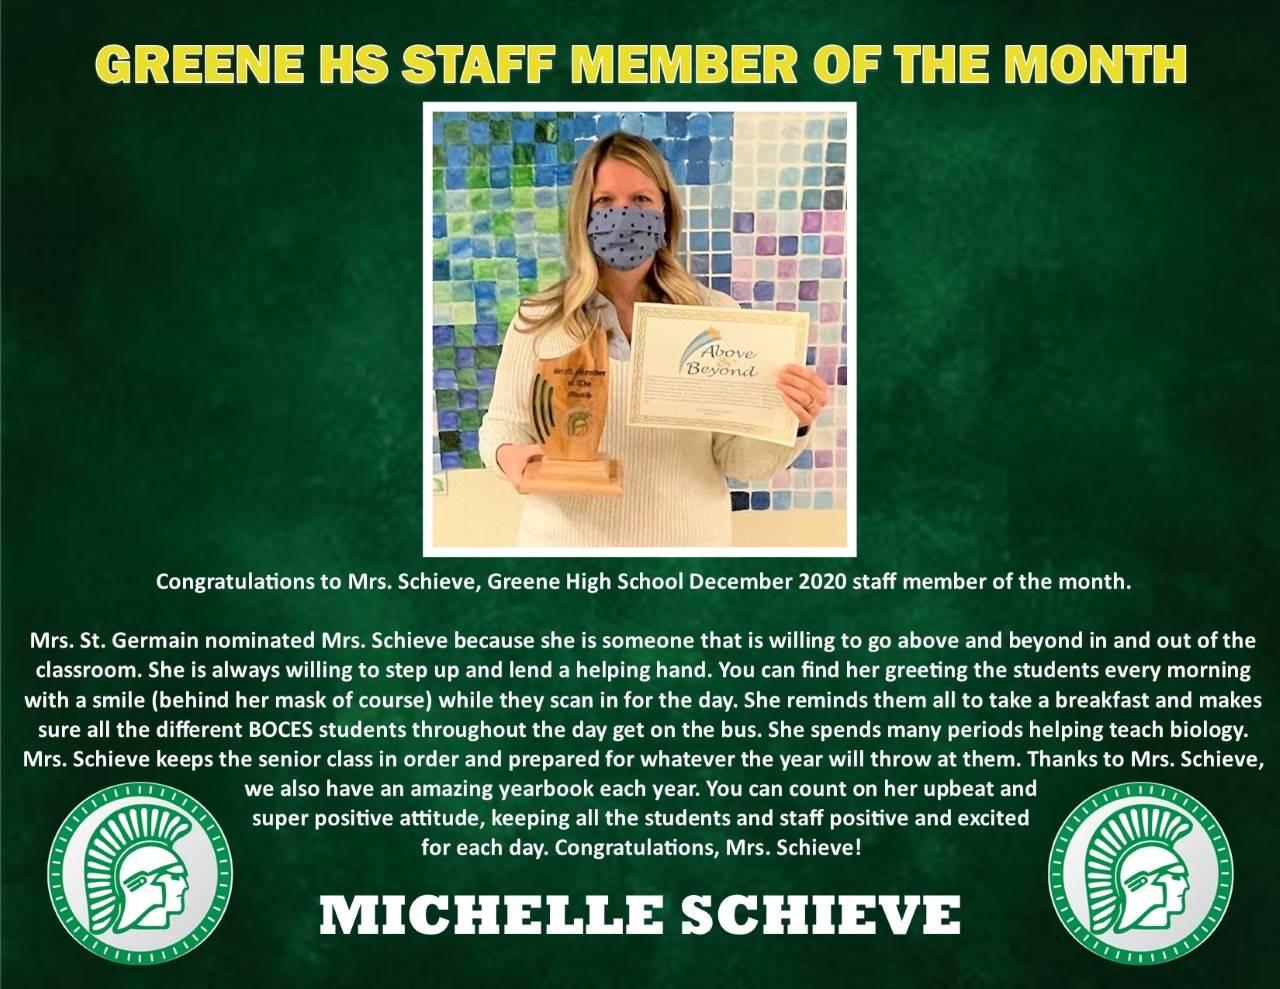 Mrs. Schieve's Staff Member of the Month photo & bio